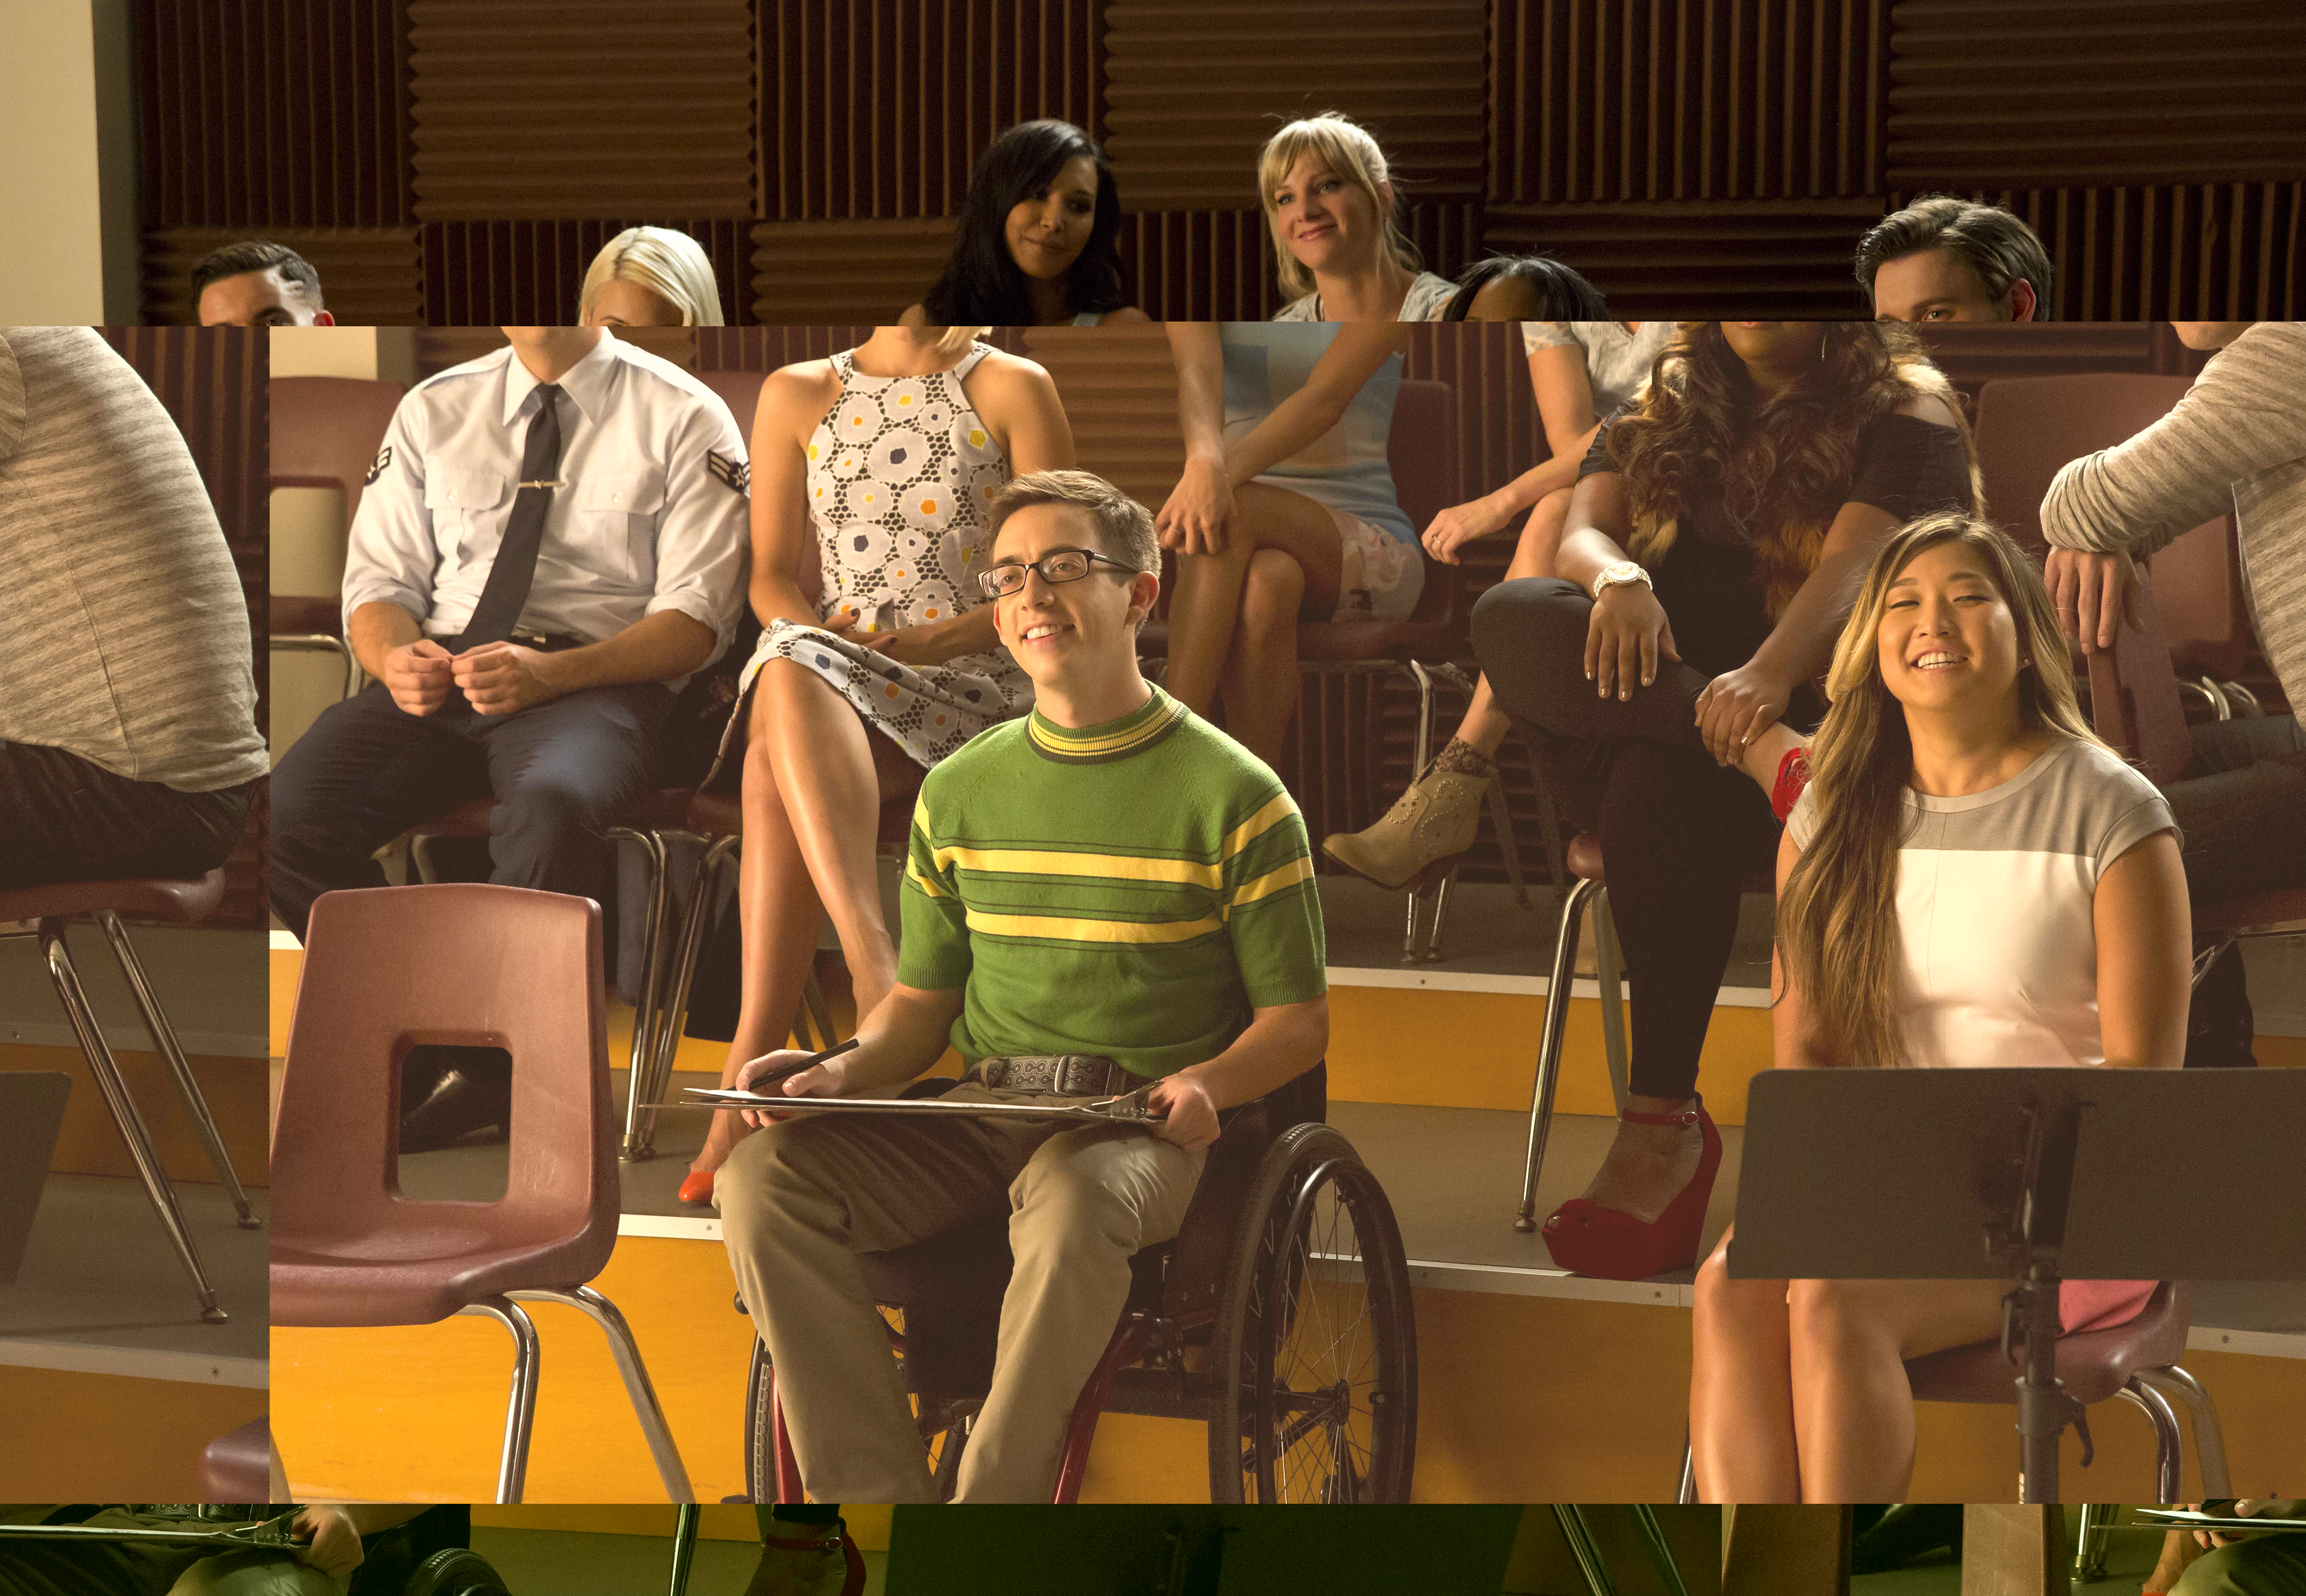 Glee Season 6 Image 7